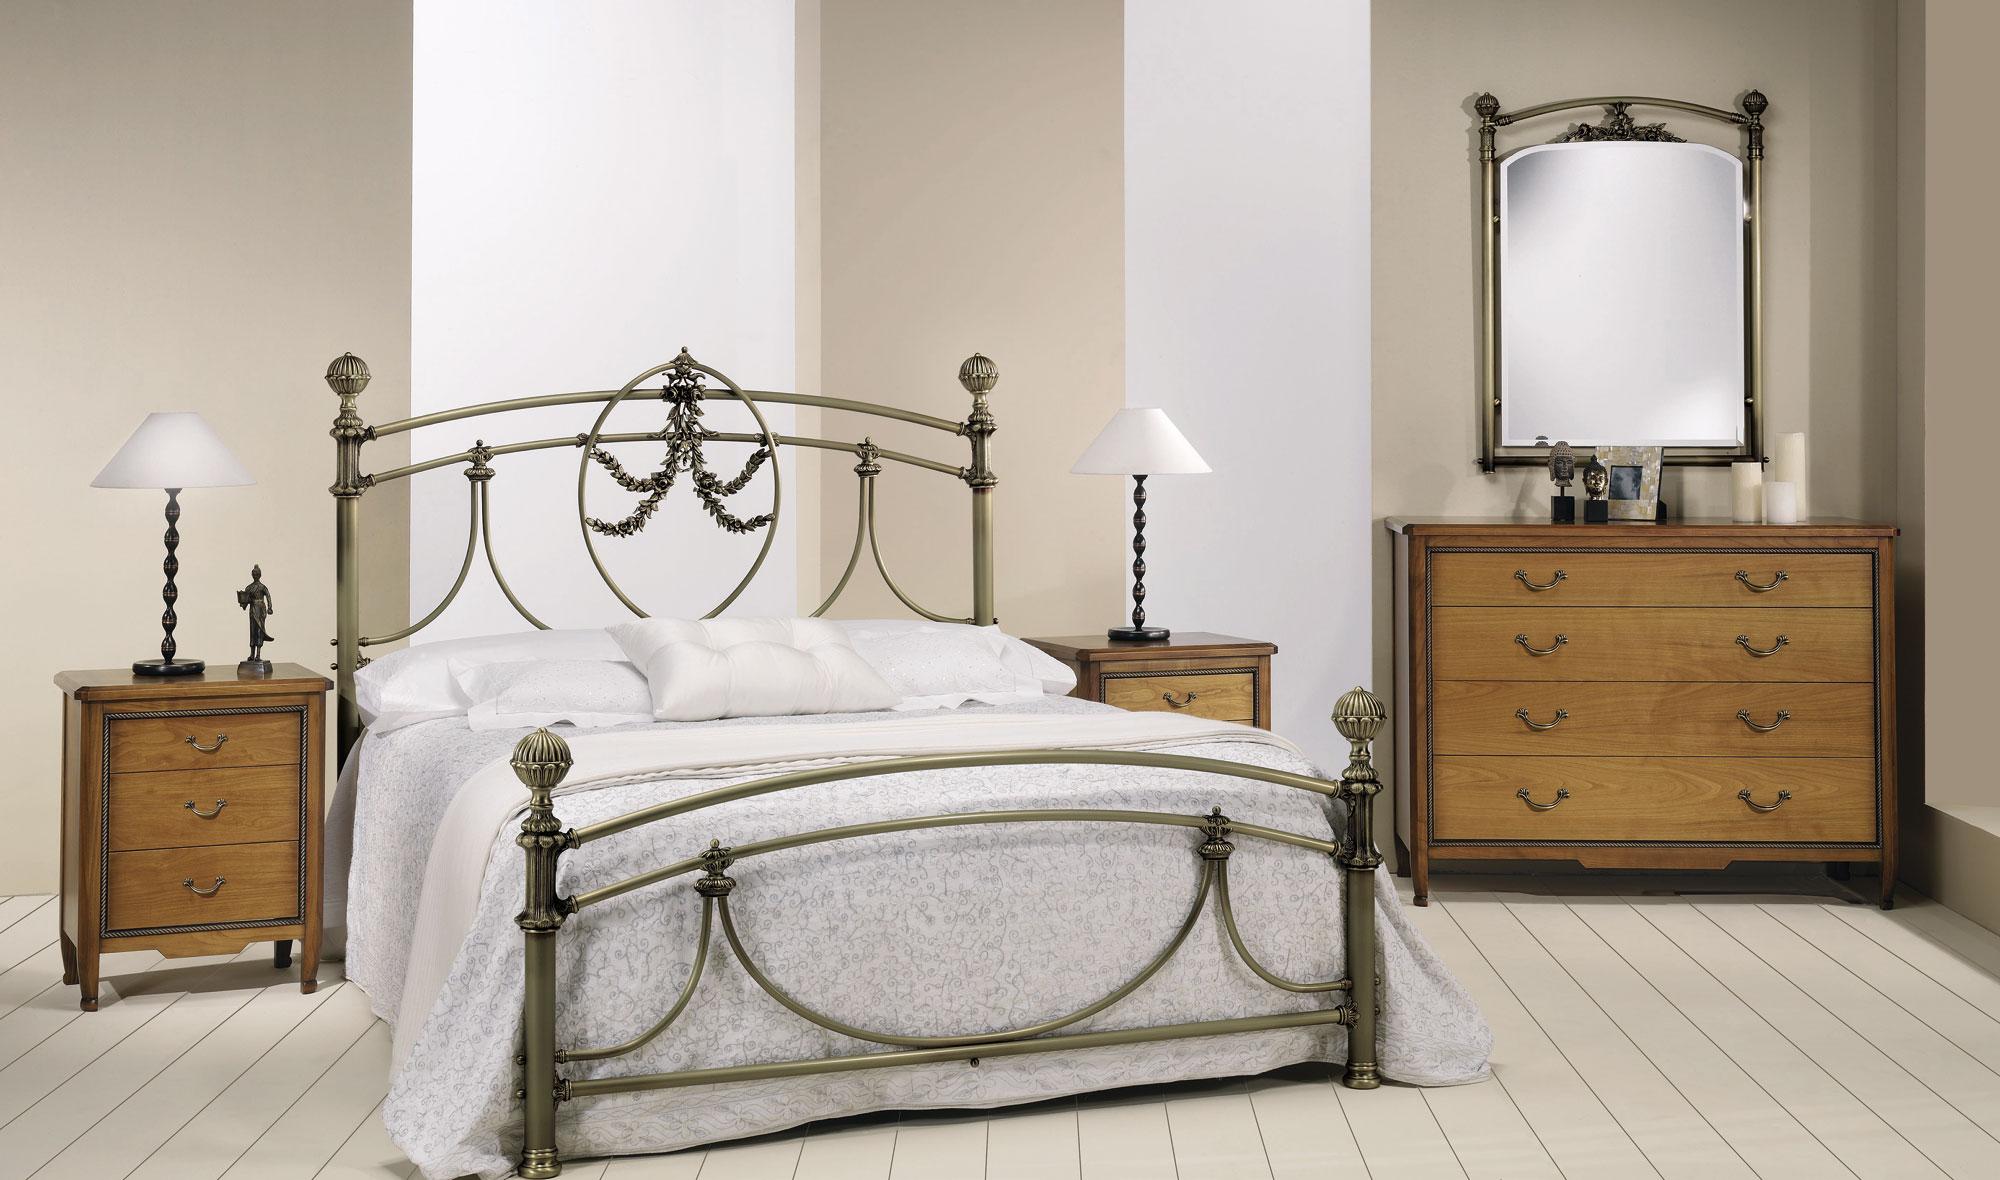 Dormitorio forja Alexia en Portobellostreet